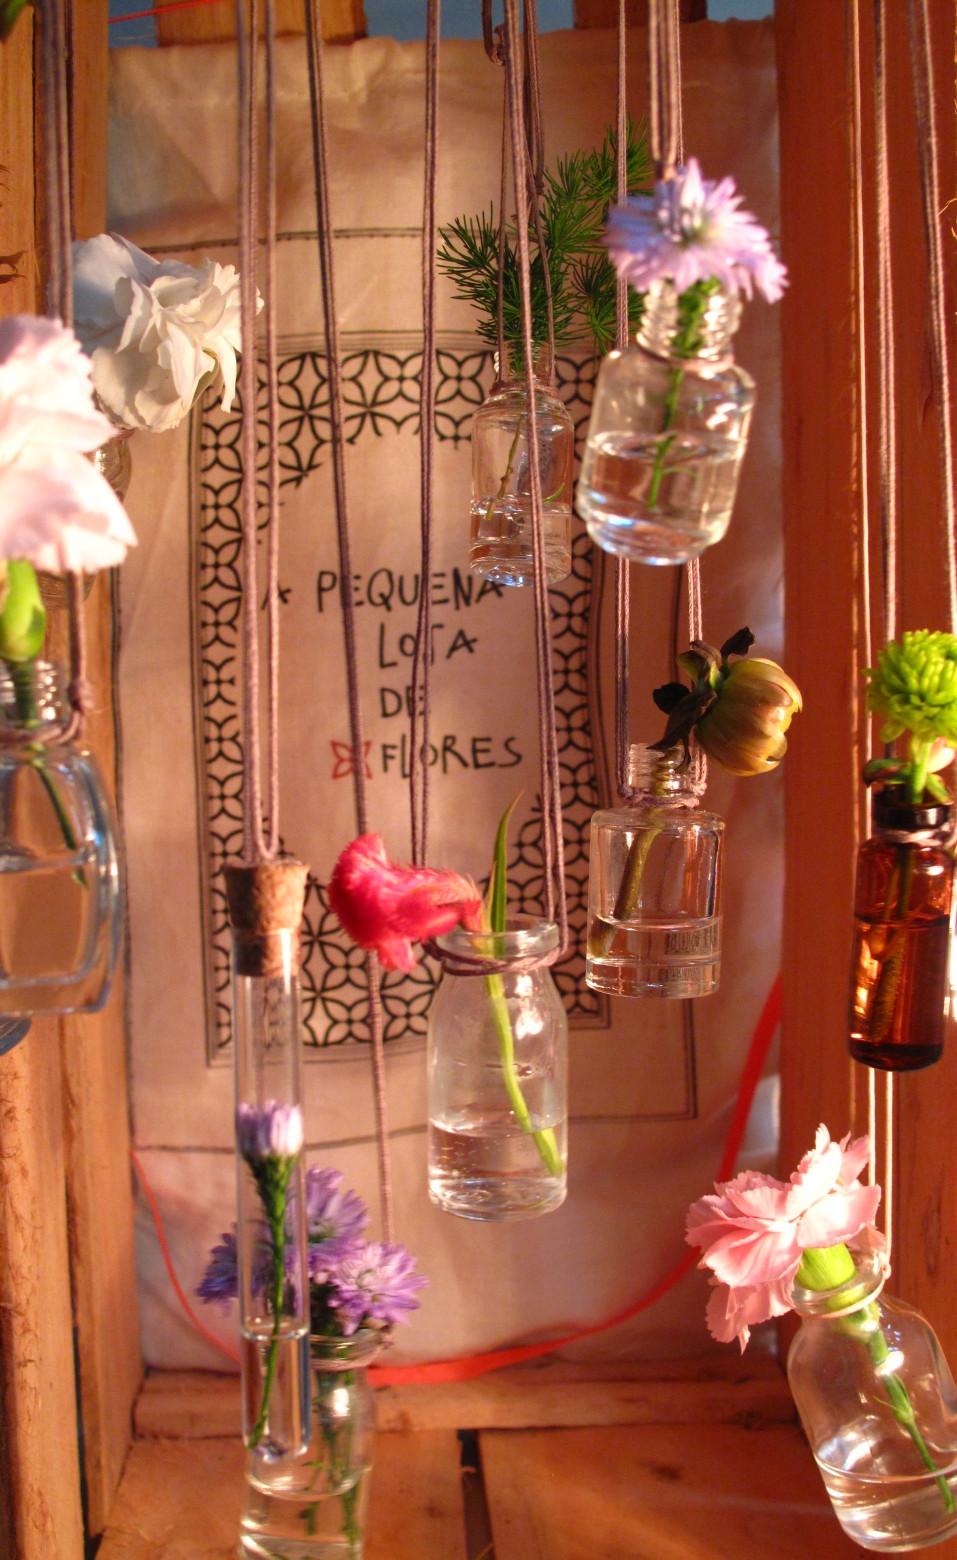 Flores no colar 012.jpg